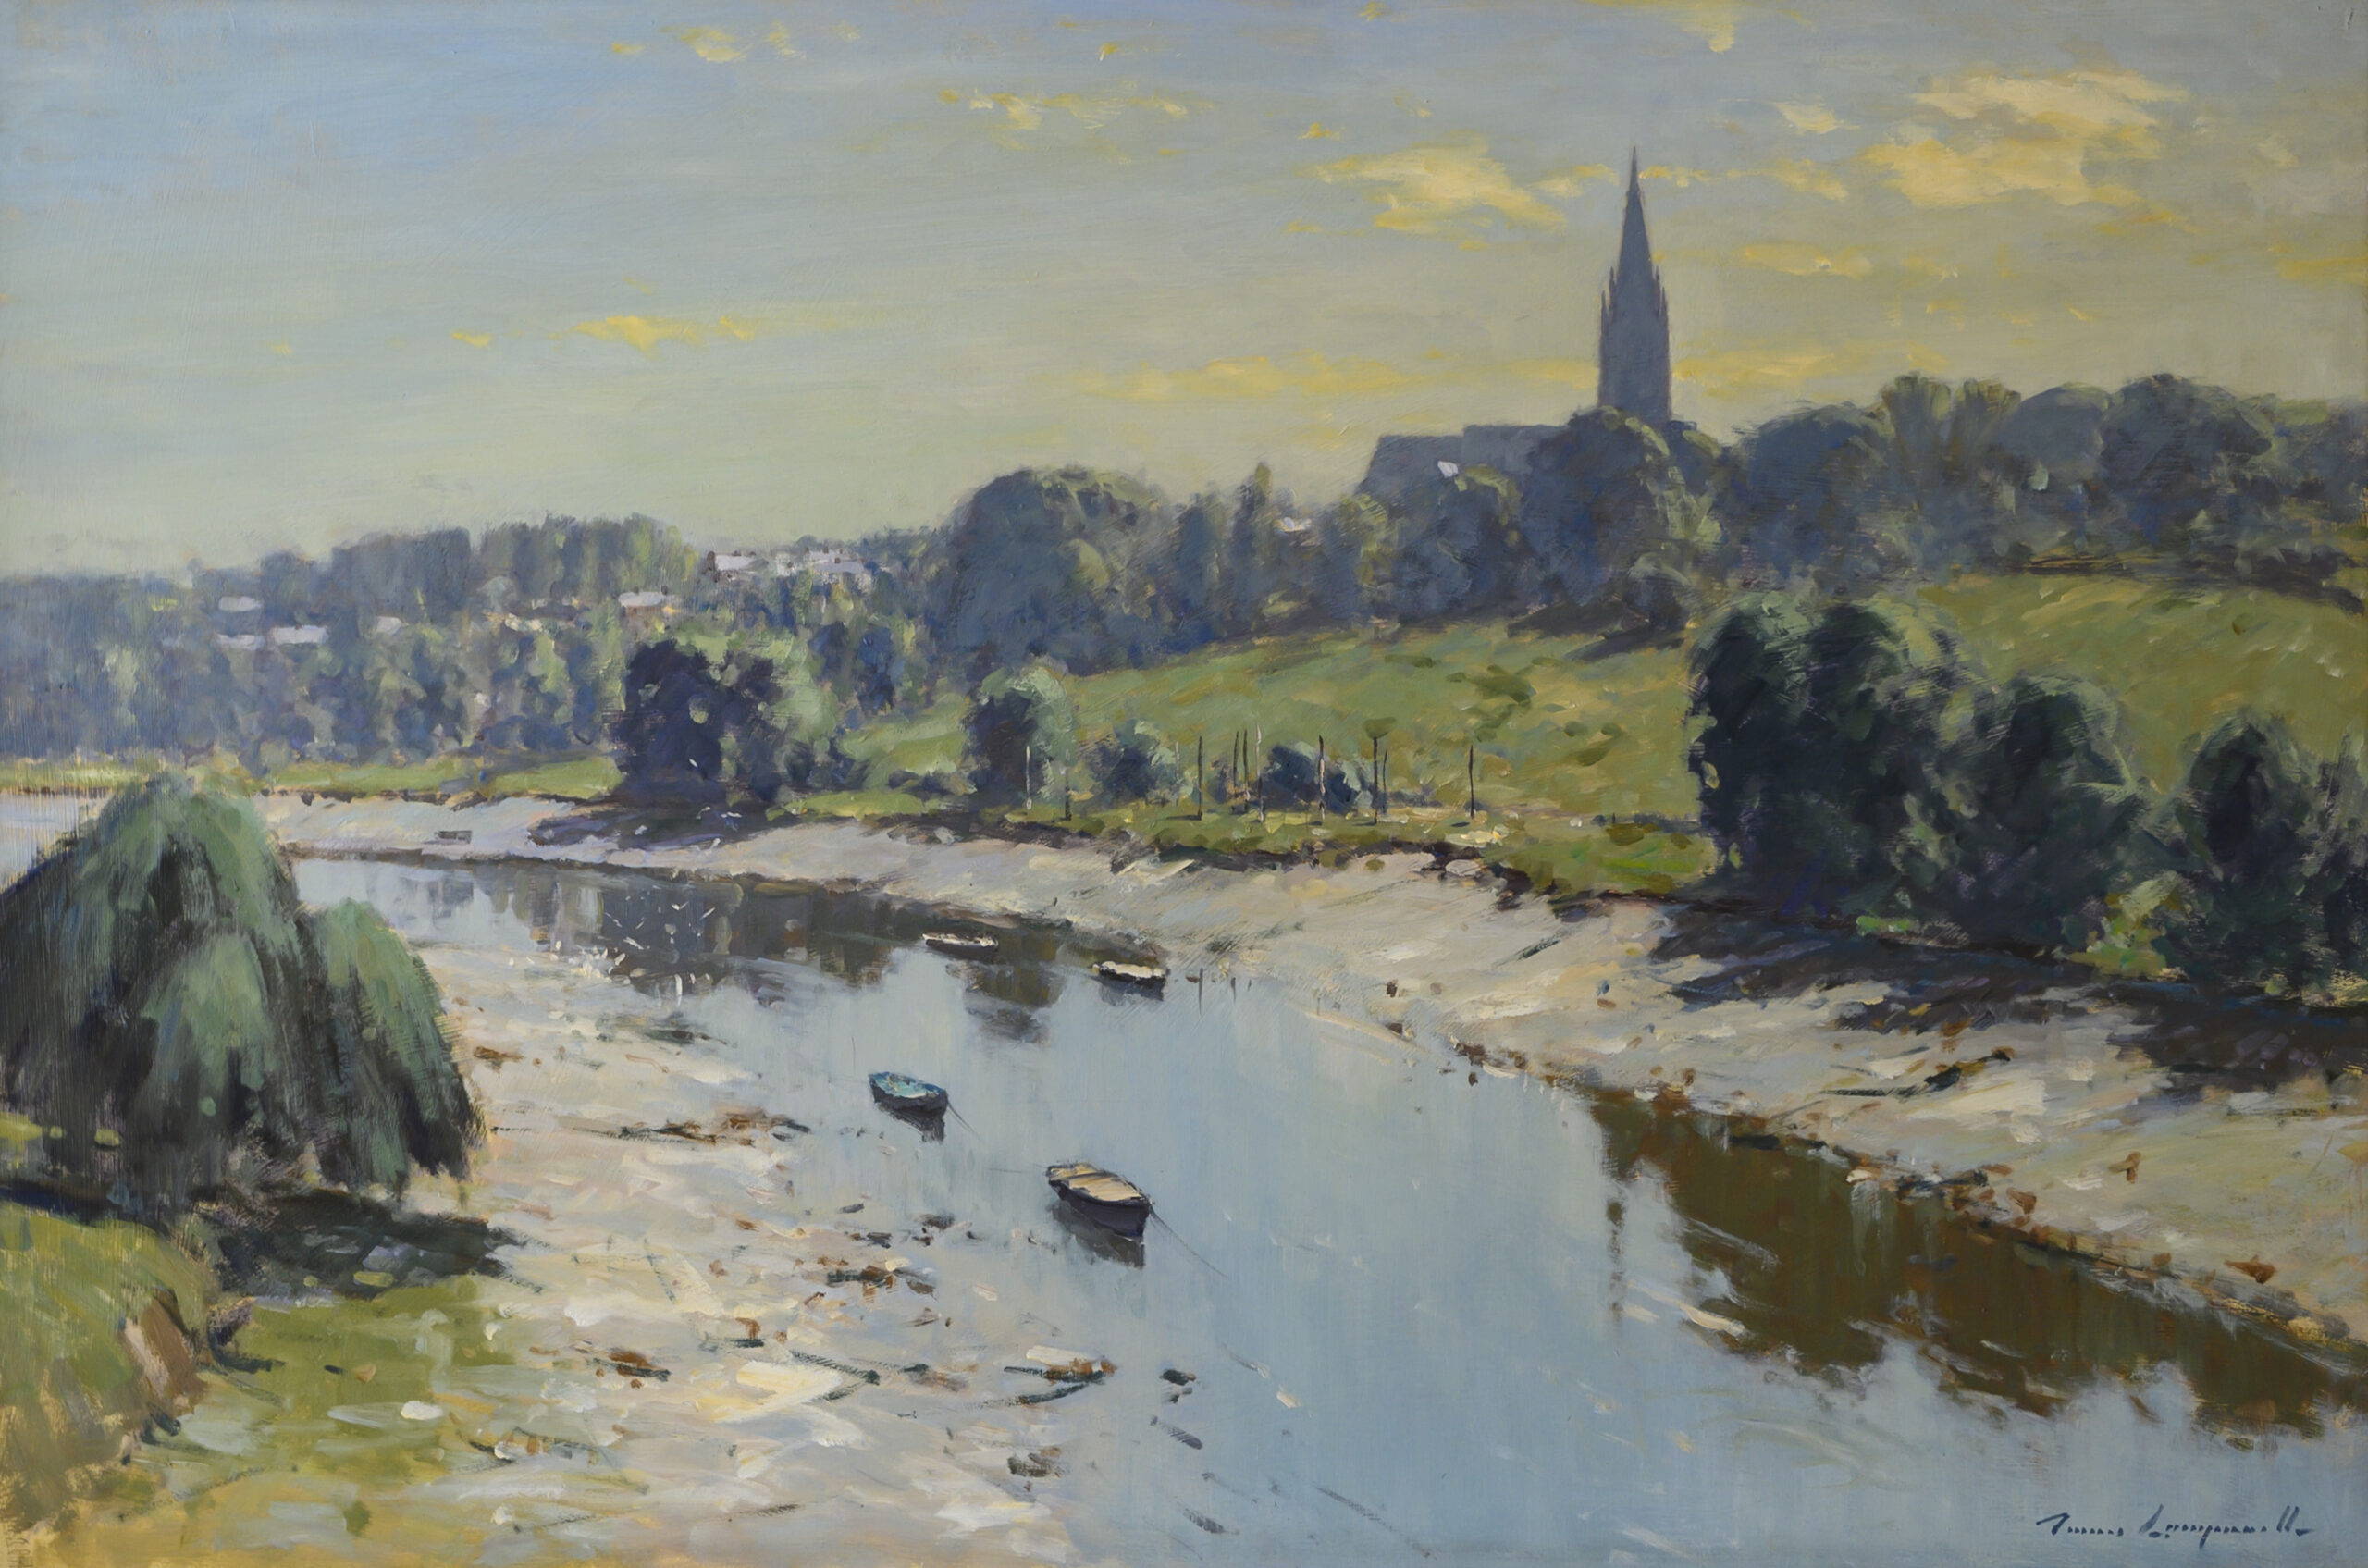 The River Dee at Handbridge